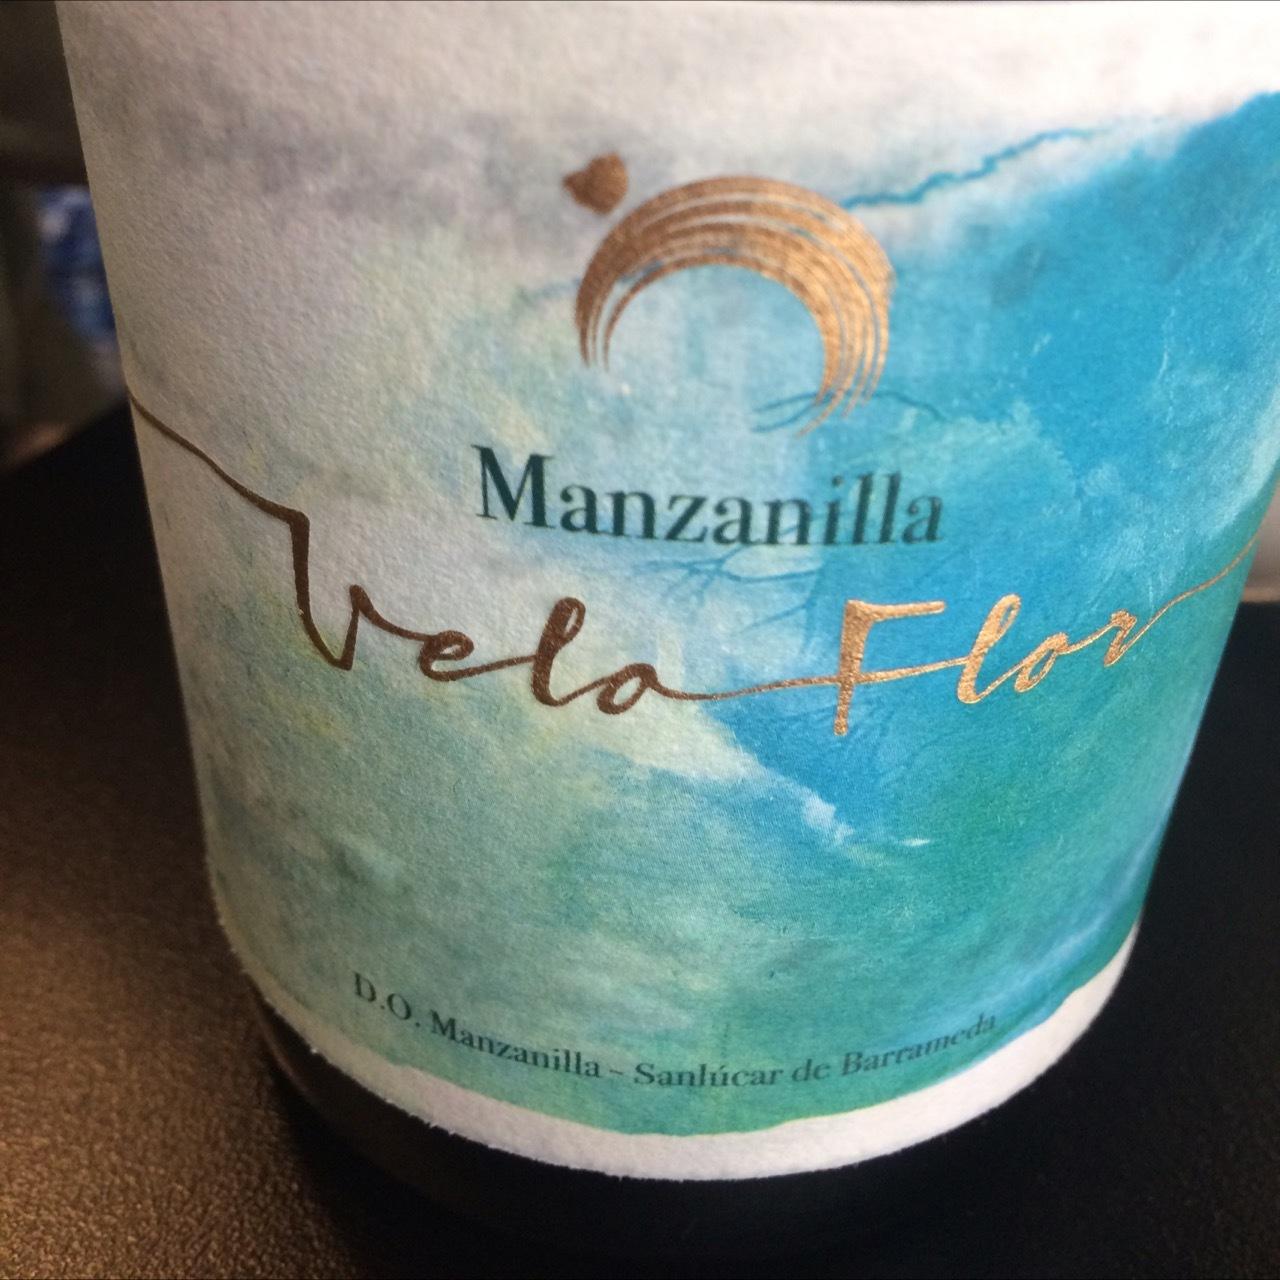 0ce2c75b87 Bodegas Alonso Manzanilla Velo Flor White Blend NV – Dandelion Wine